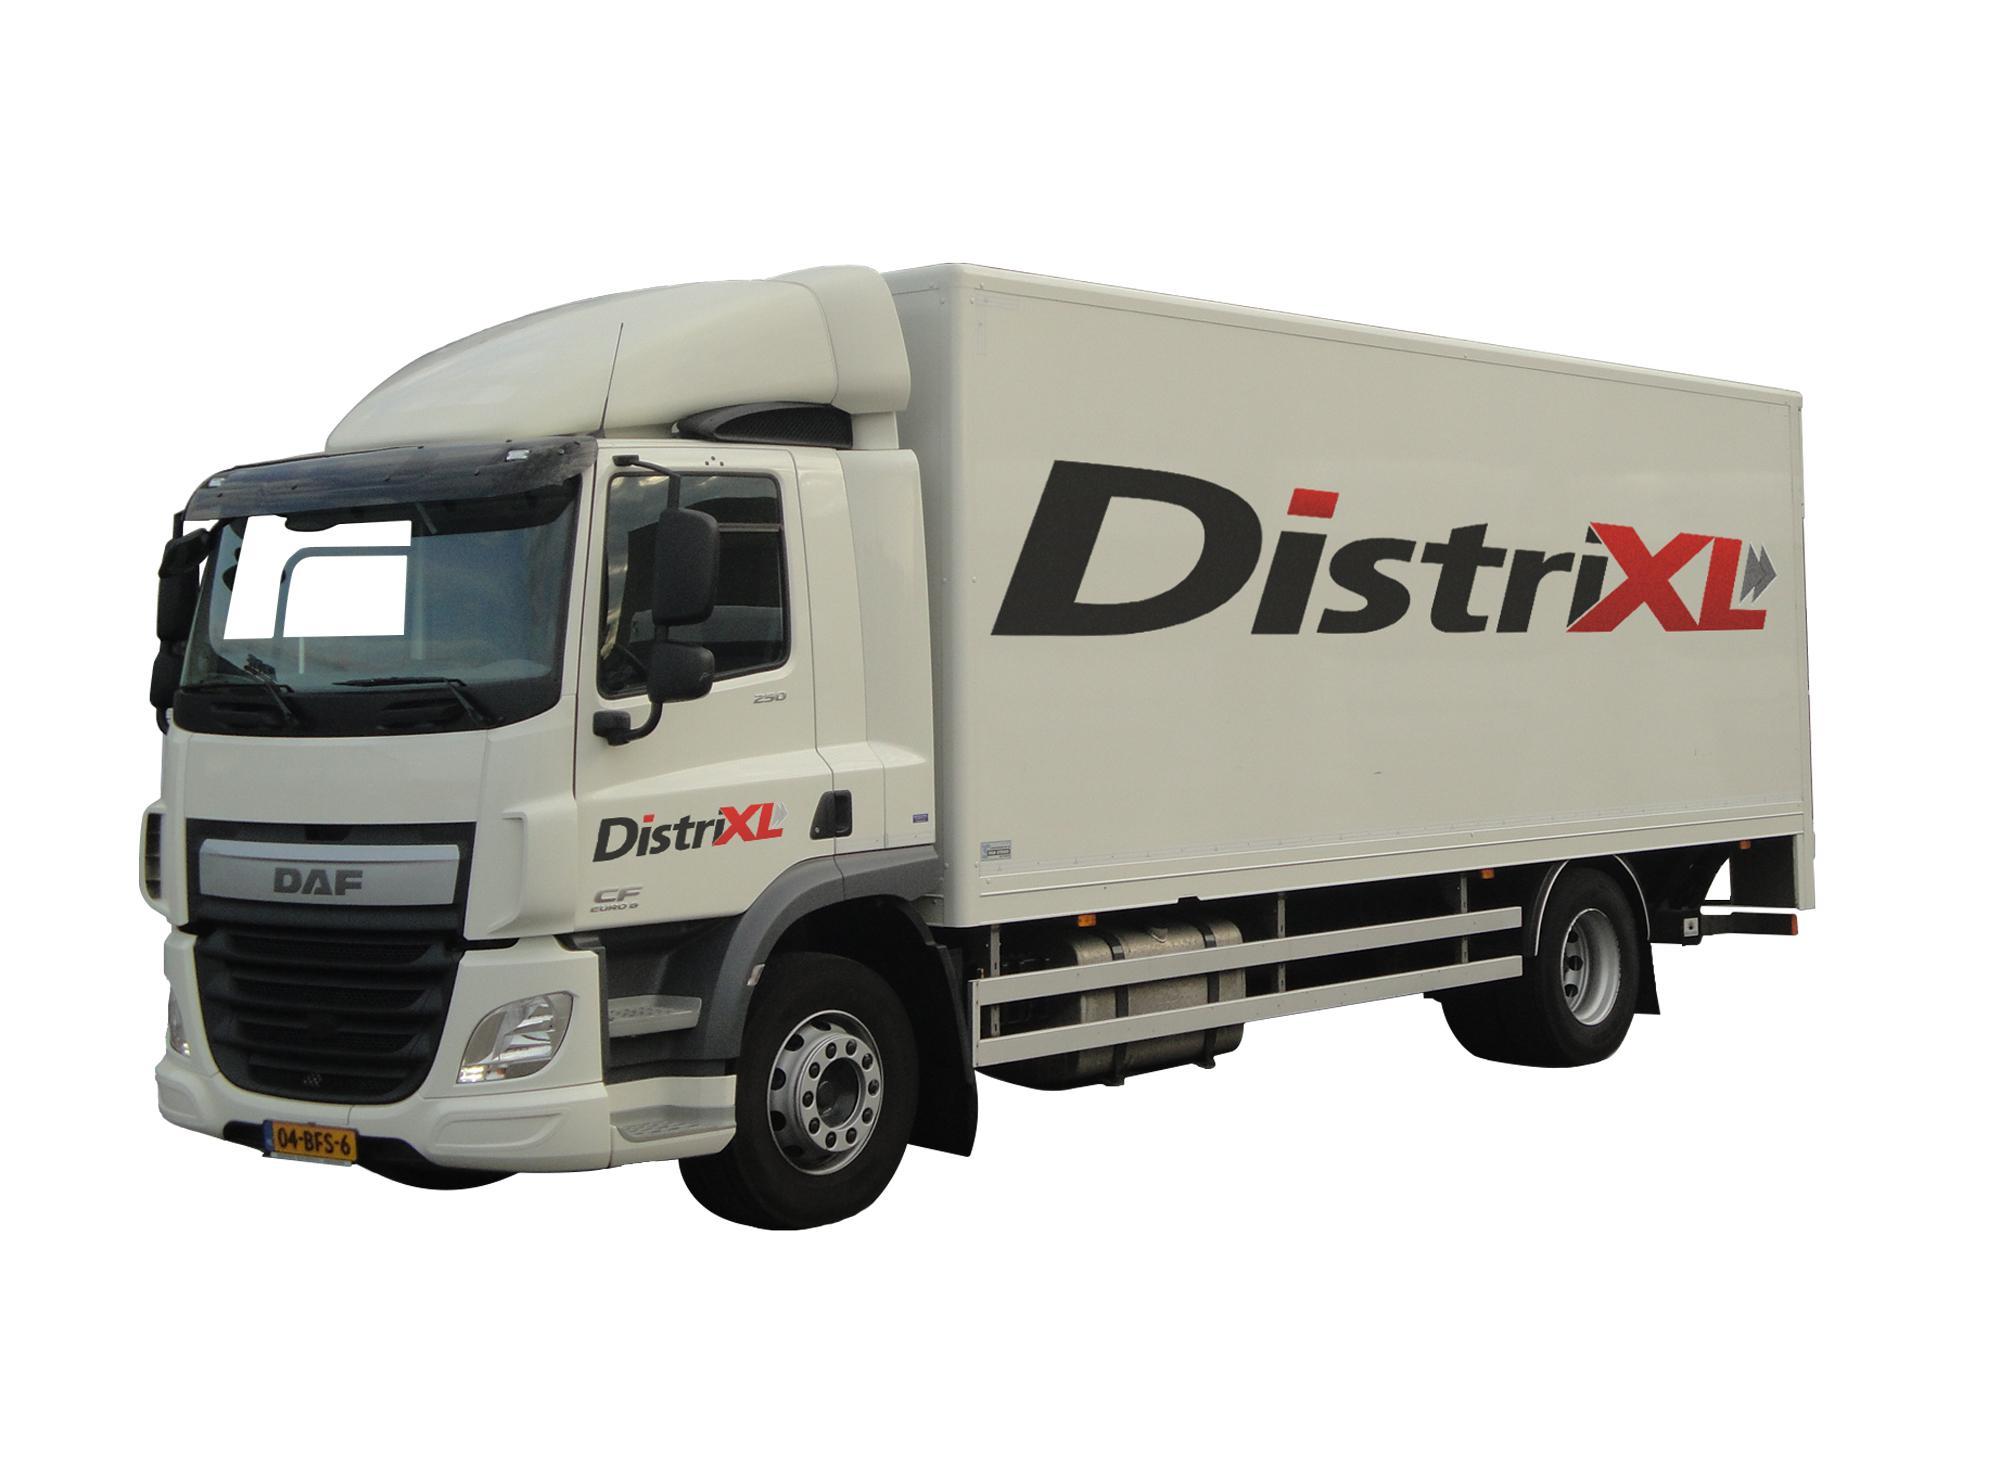 Witte DAF truck met DistriXL logo's